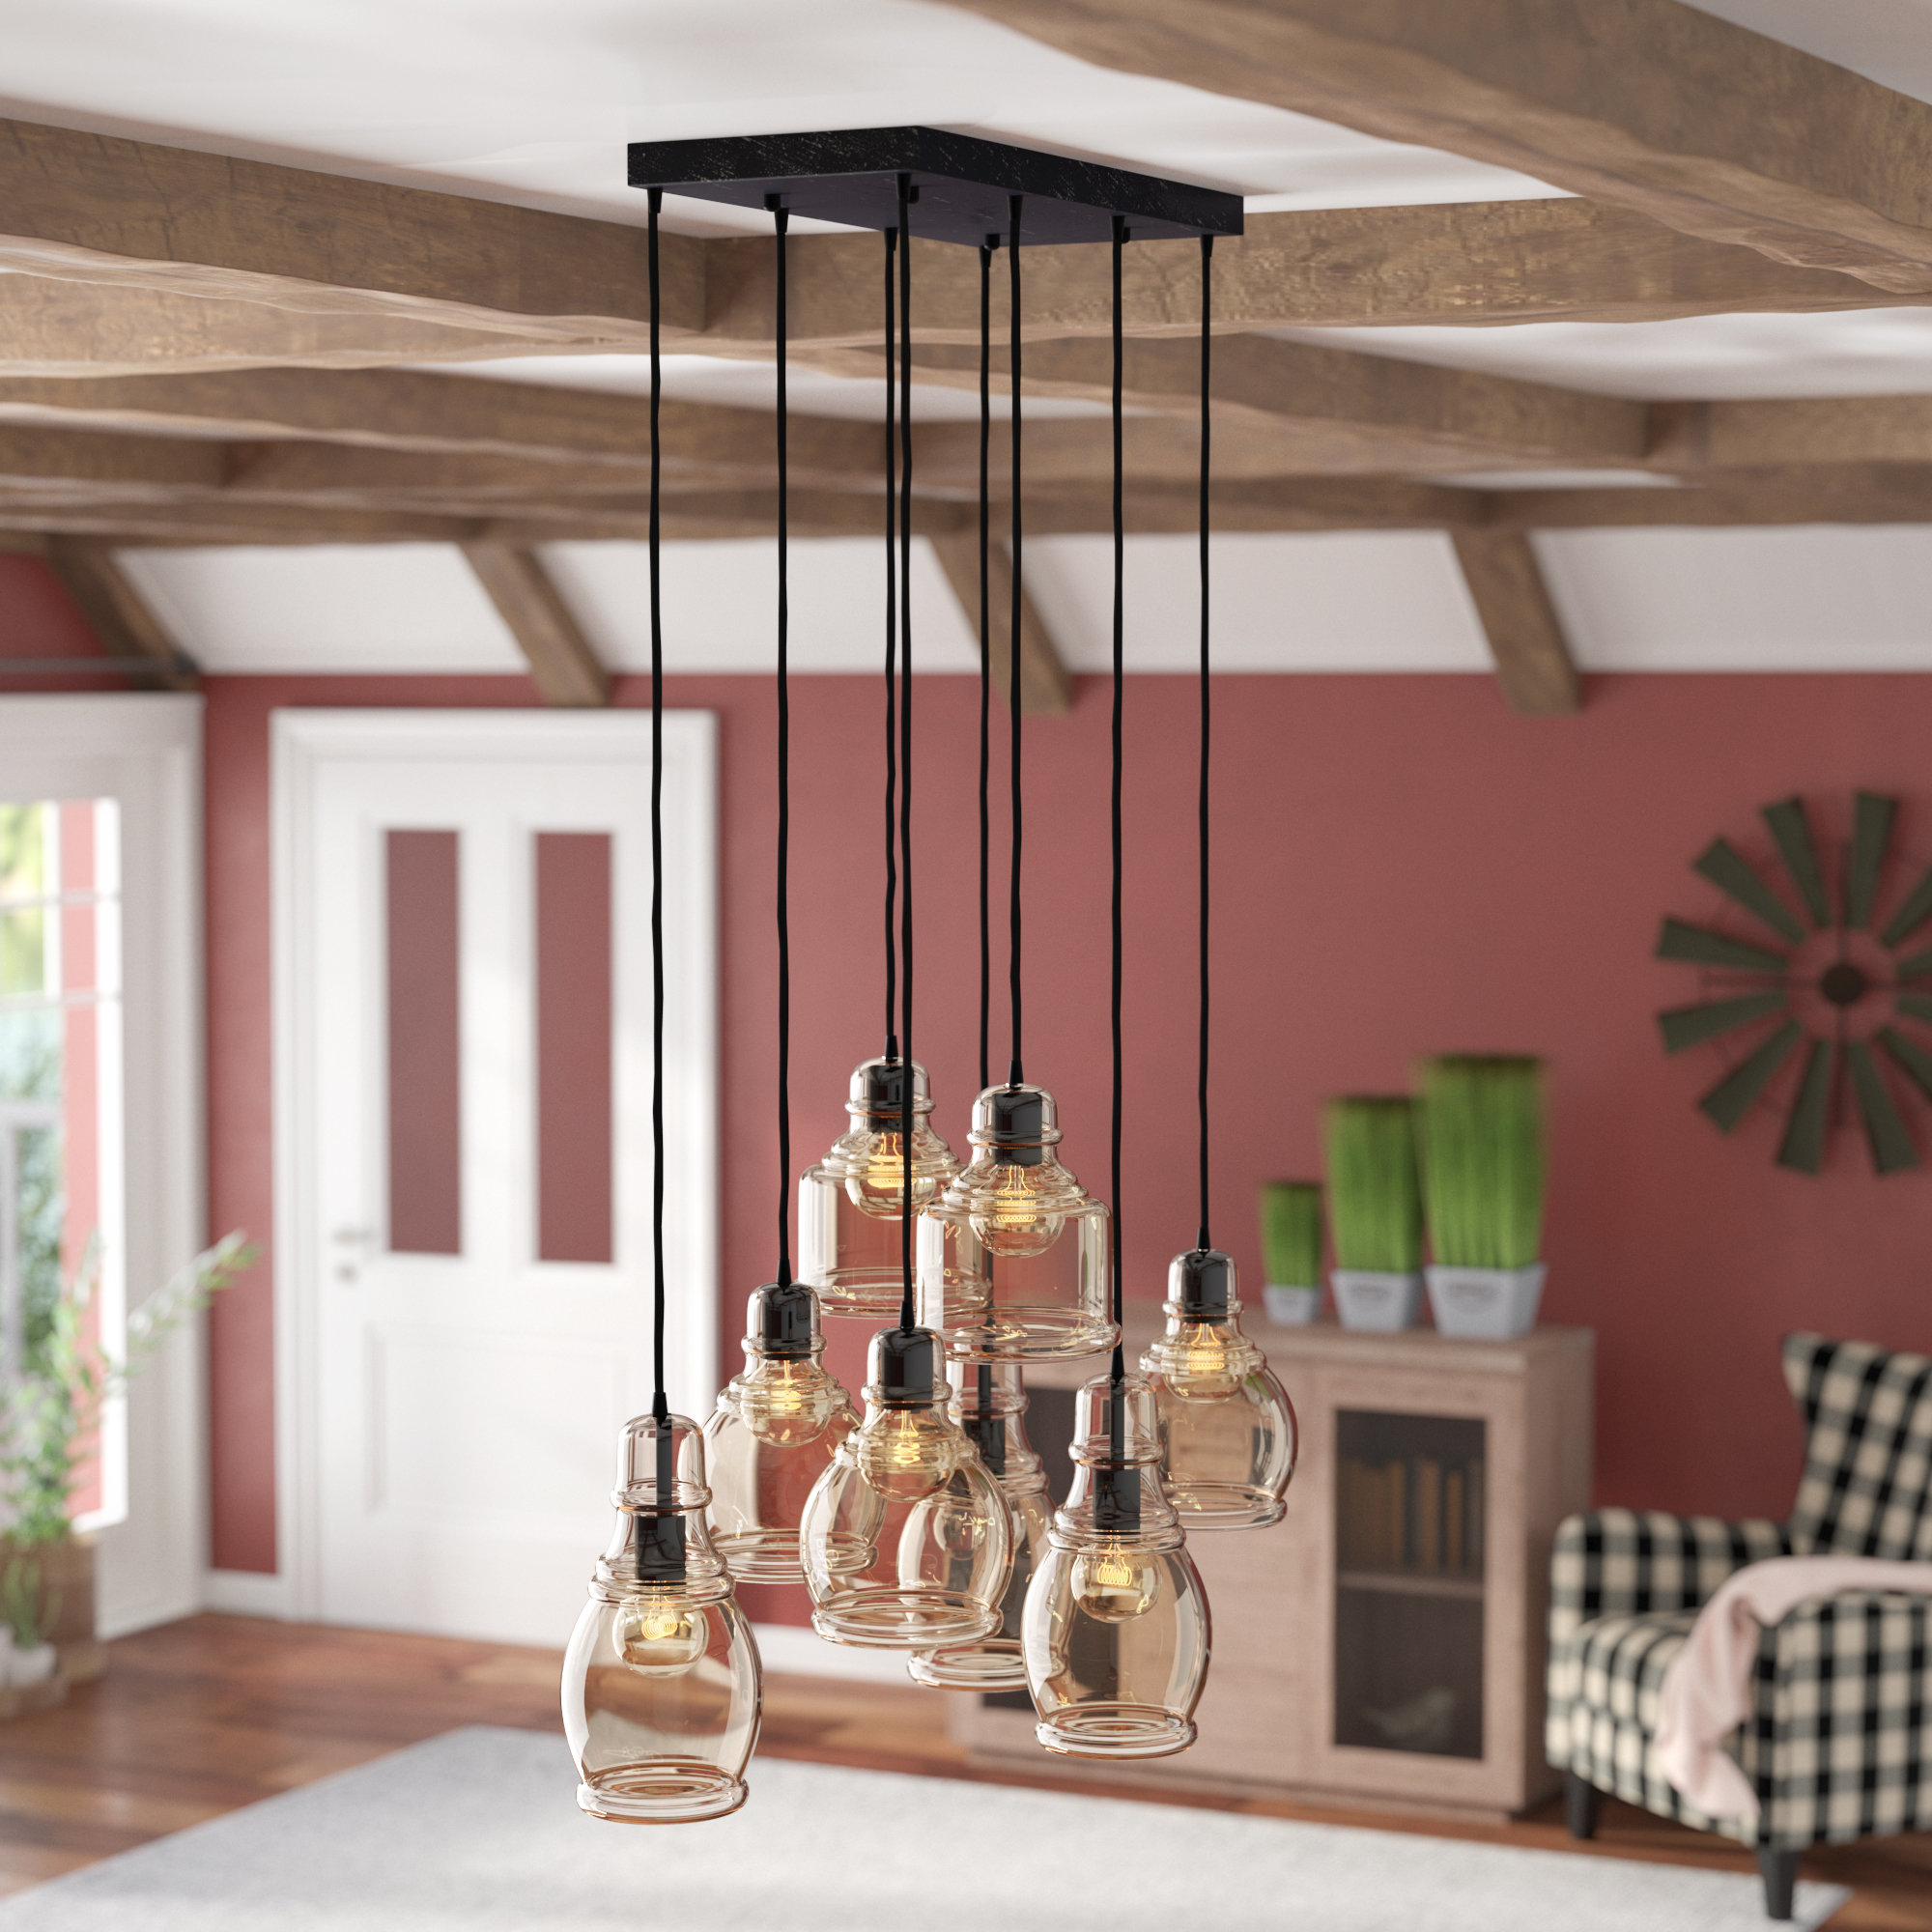 Pruett Cognac Glass 8 Light Cluster Pendants Intended For Newest Pruett Cognac Glass 8 Light Cluster Pendant (Gallery 1 of 20)